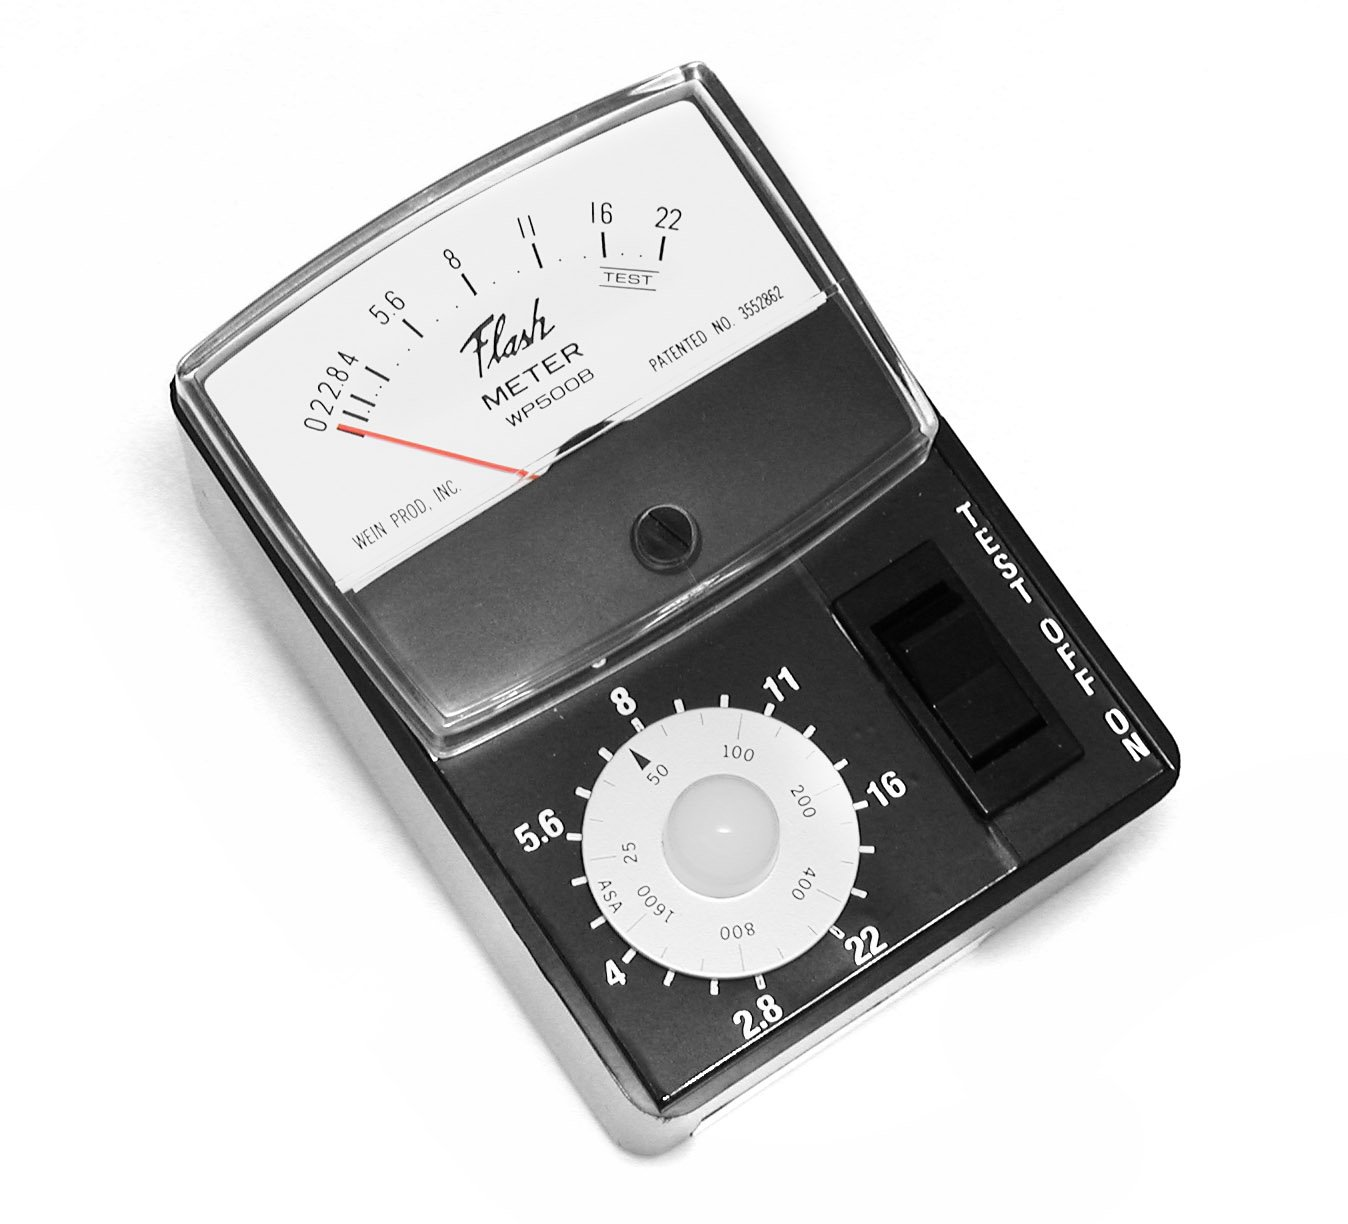 Wein Products W950010 (WP-500B) Standard Flashmeter by Wein